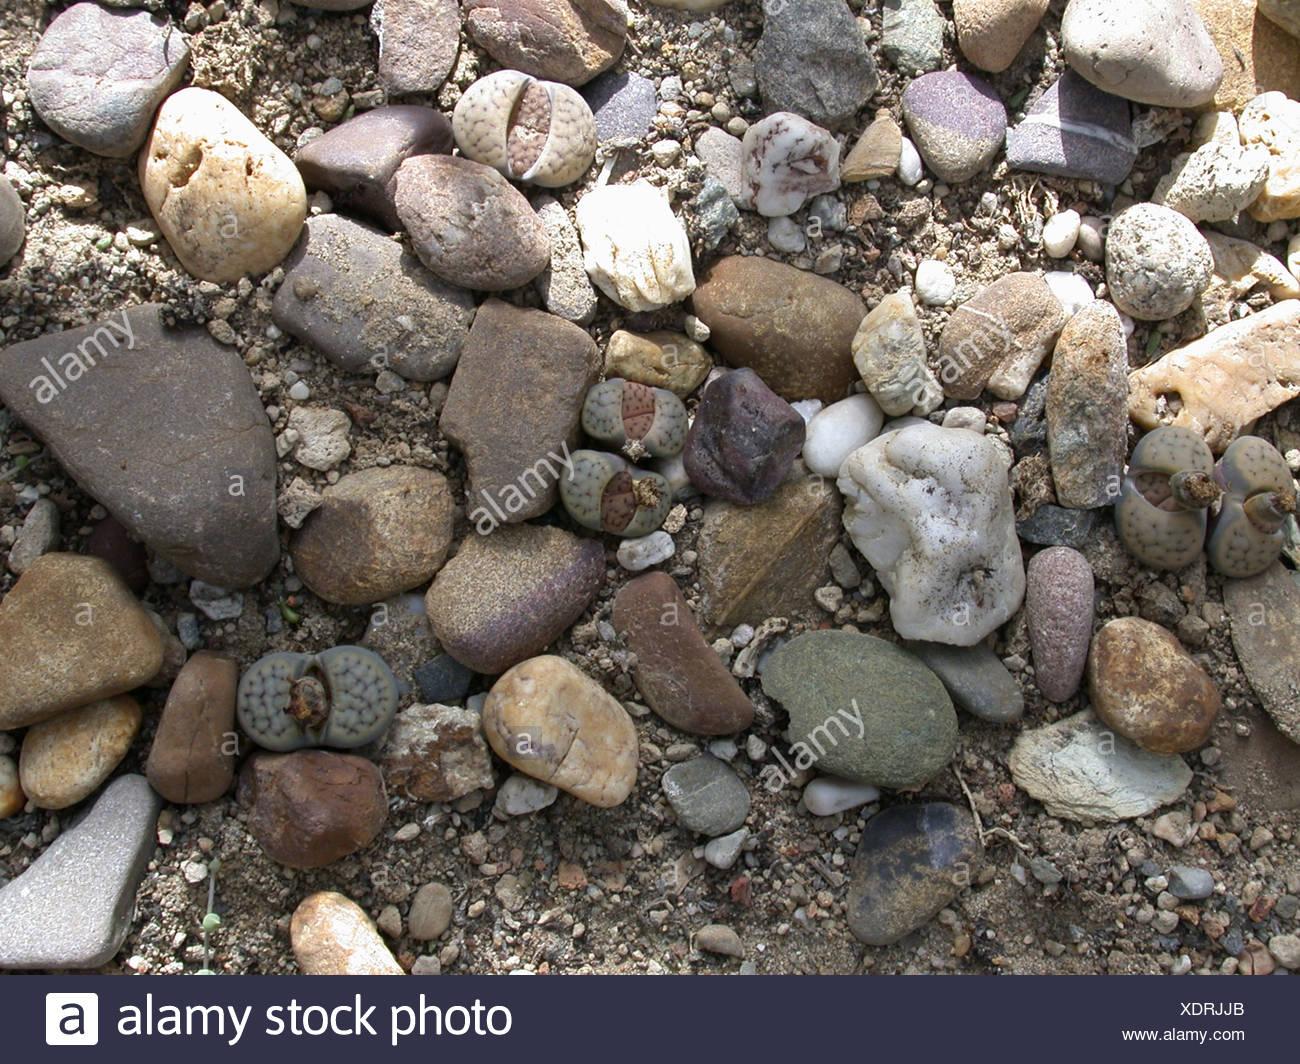 stone plant (Lithops spec.), hideen between stones Stock Photo